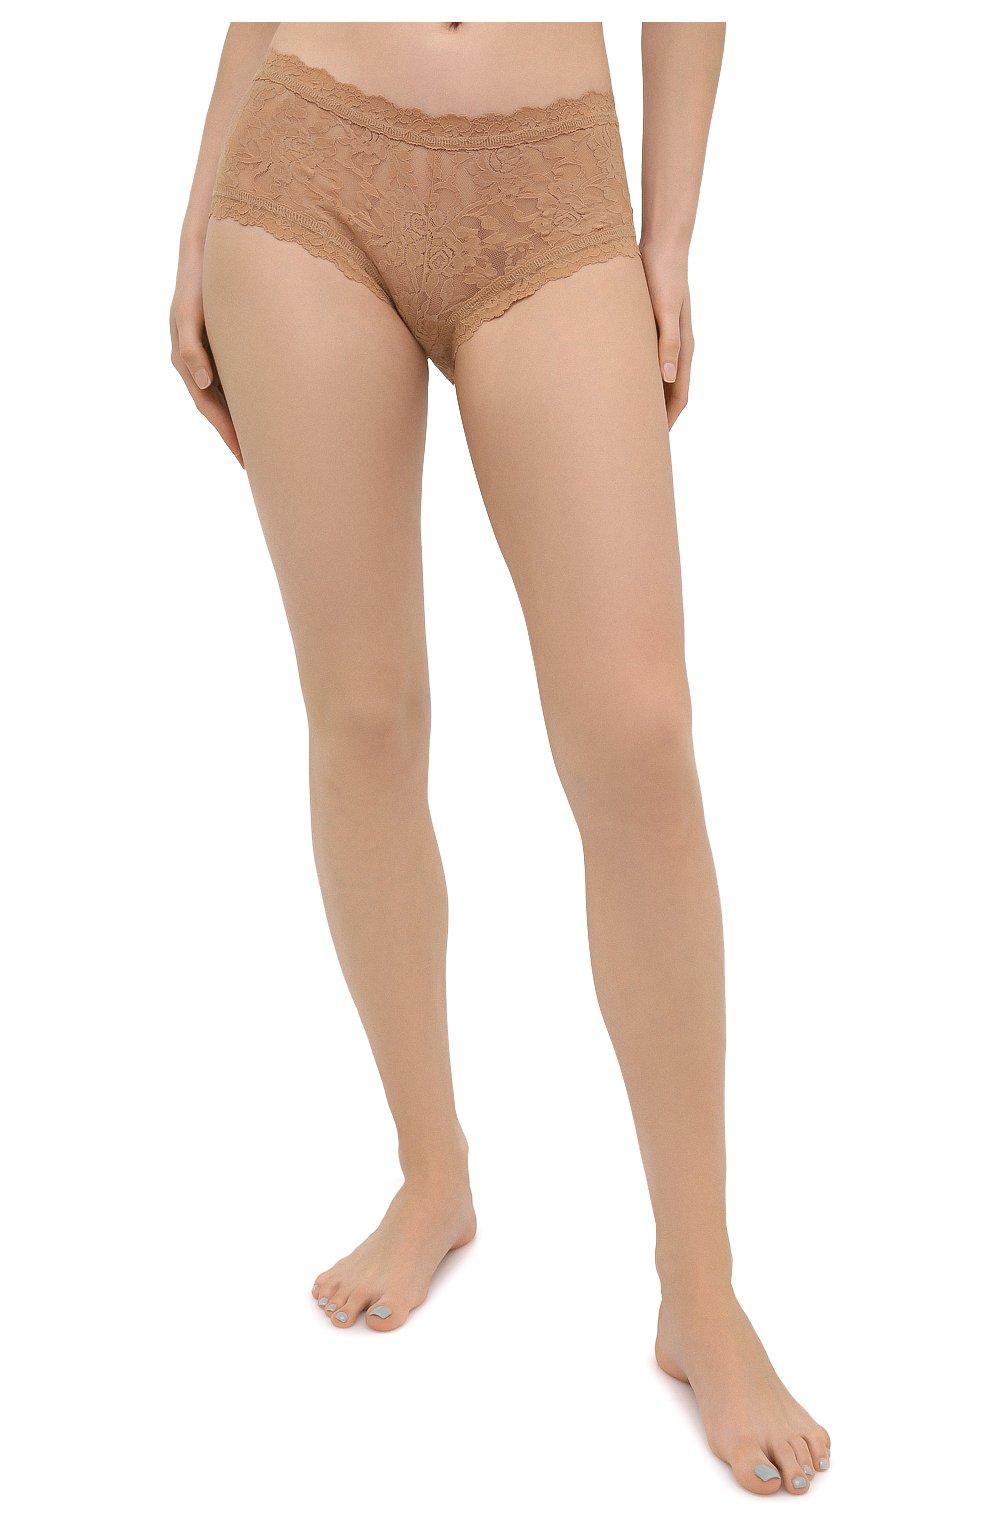 Женские трусы-шорты HANKY PANKY бежевого цвета, арт. 4812   Фото 2